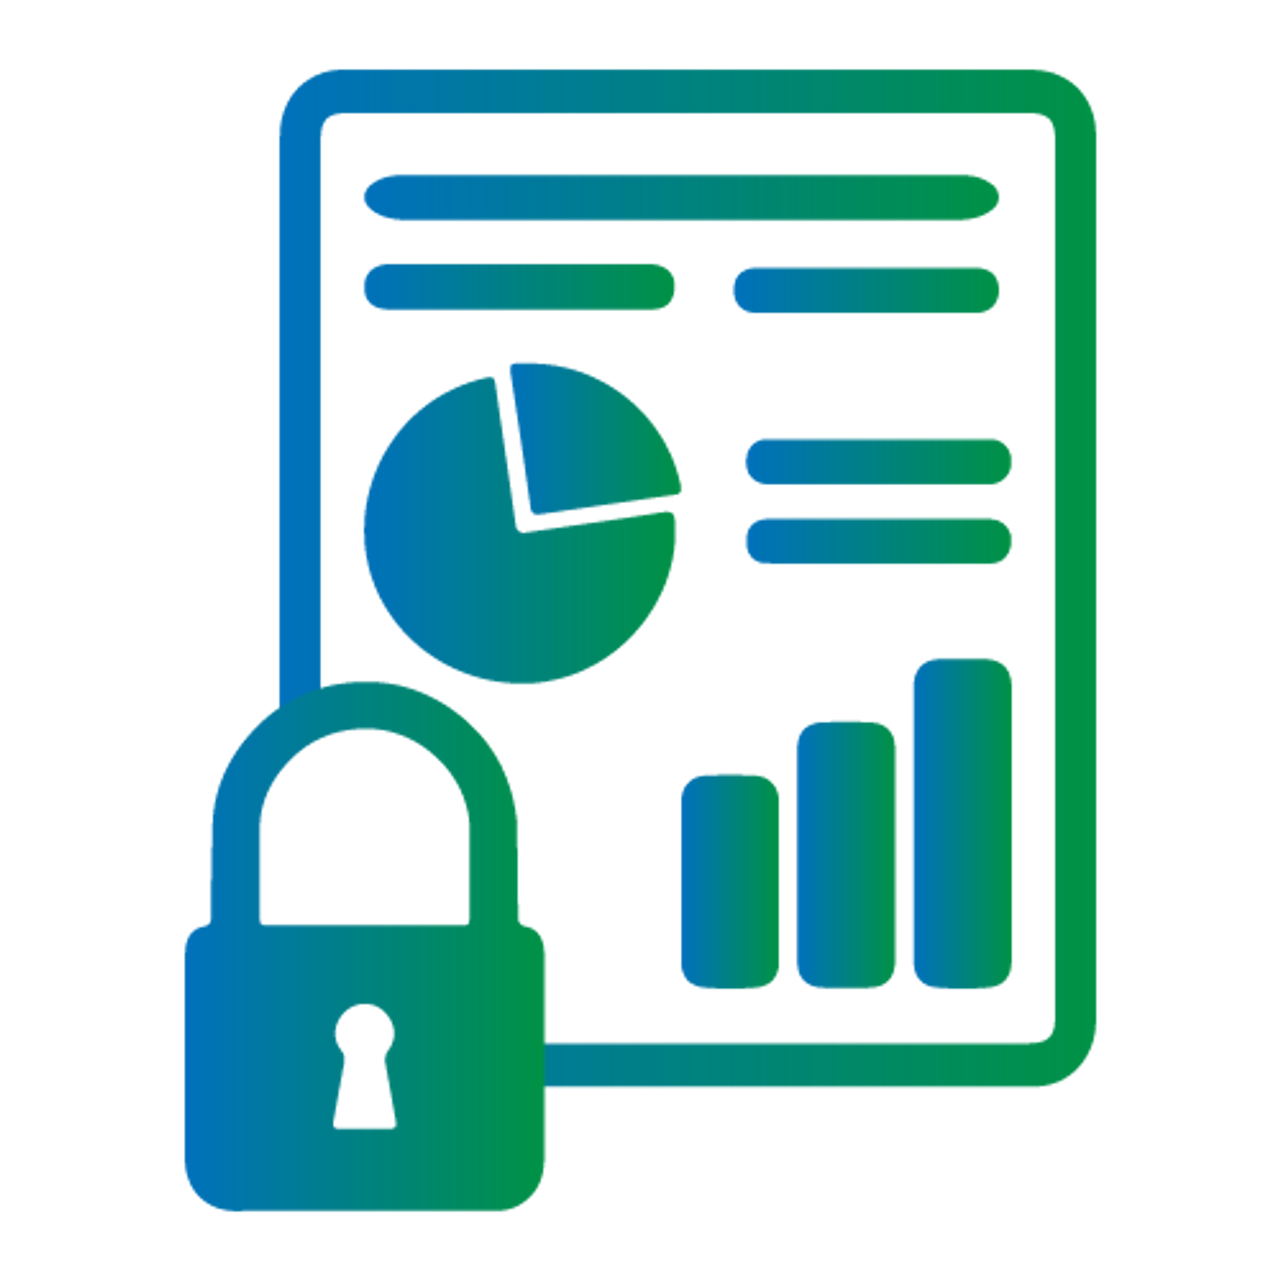 Report Management & Security